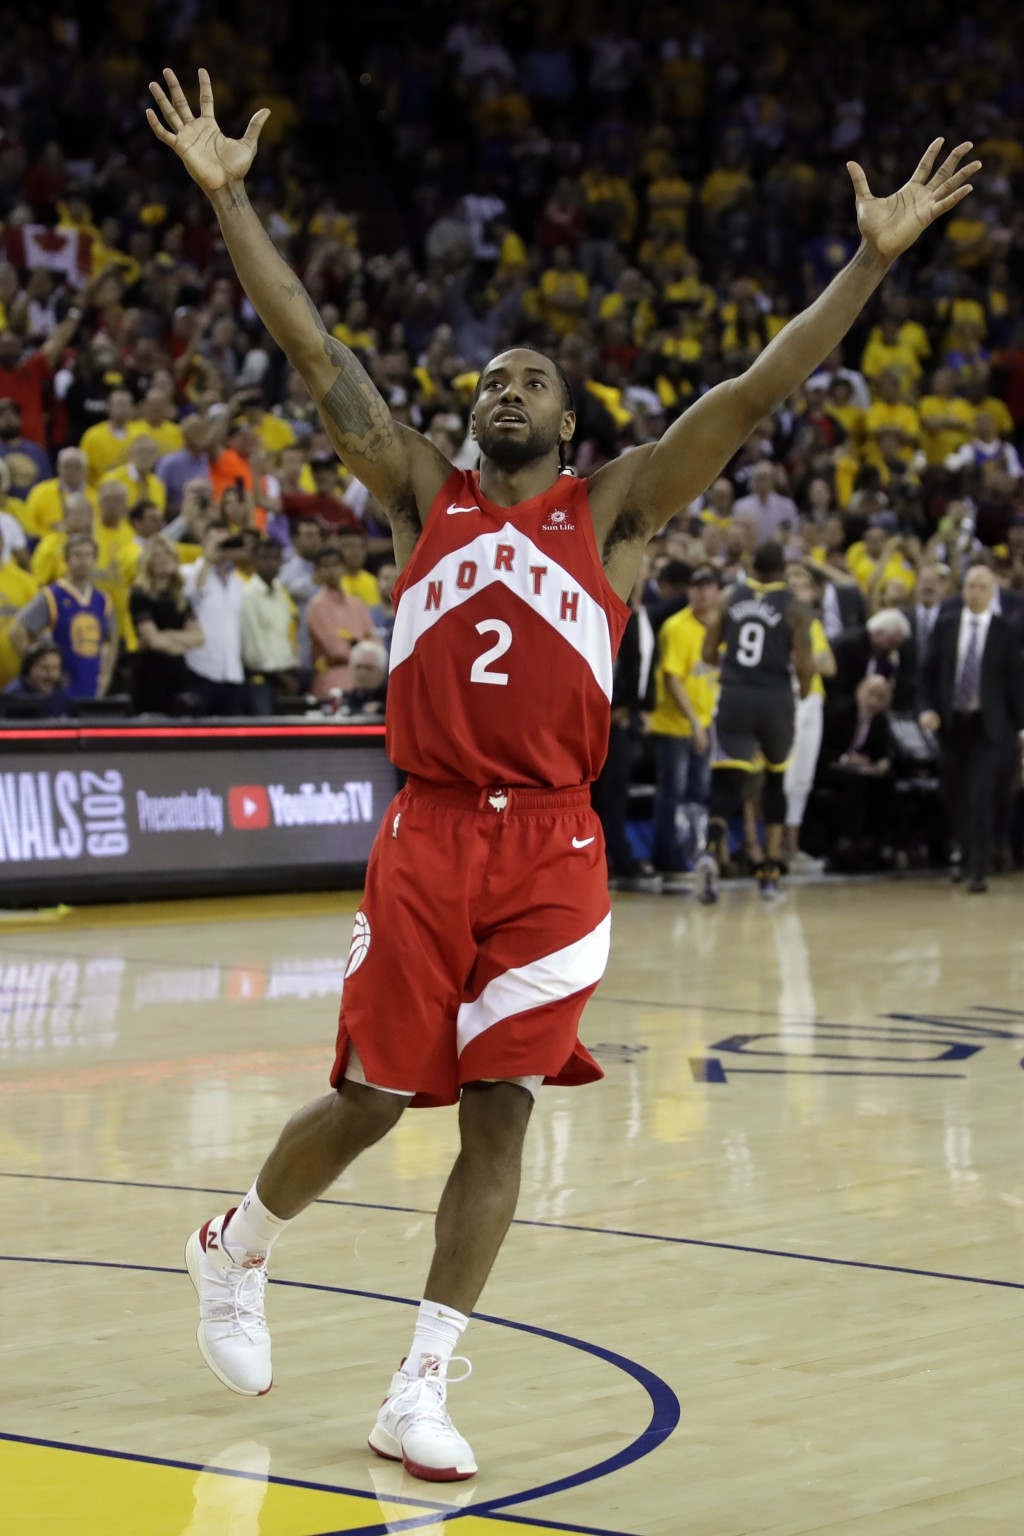 Toronto Raptors forward Kawhi Leonard celebrates after the Raptors defeat the Golden State Warriors 114-110 in Game 6 of basketball's NBA Finals in Oa